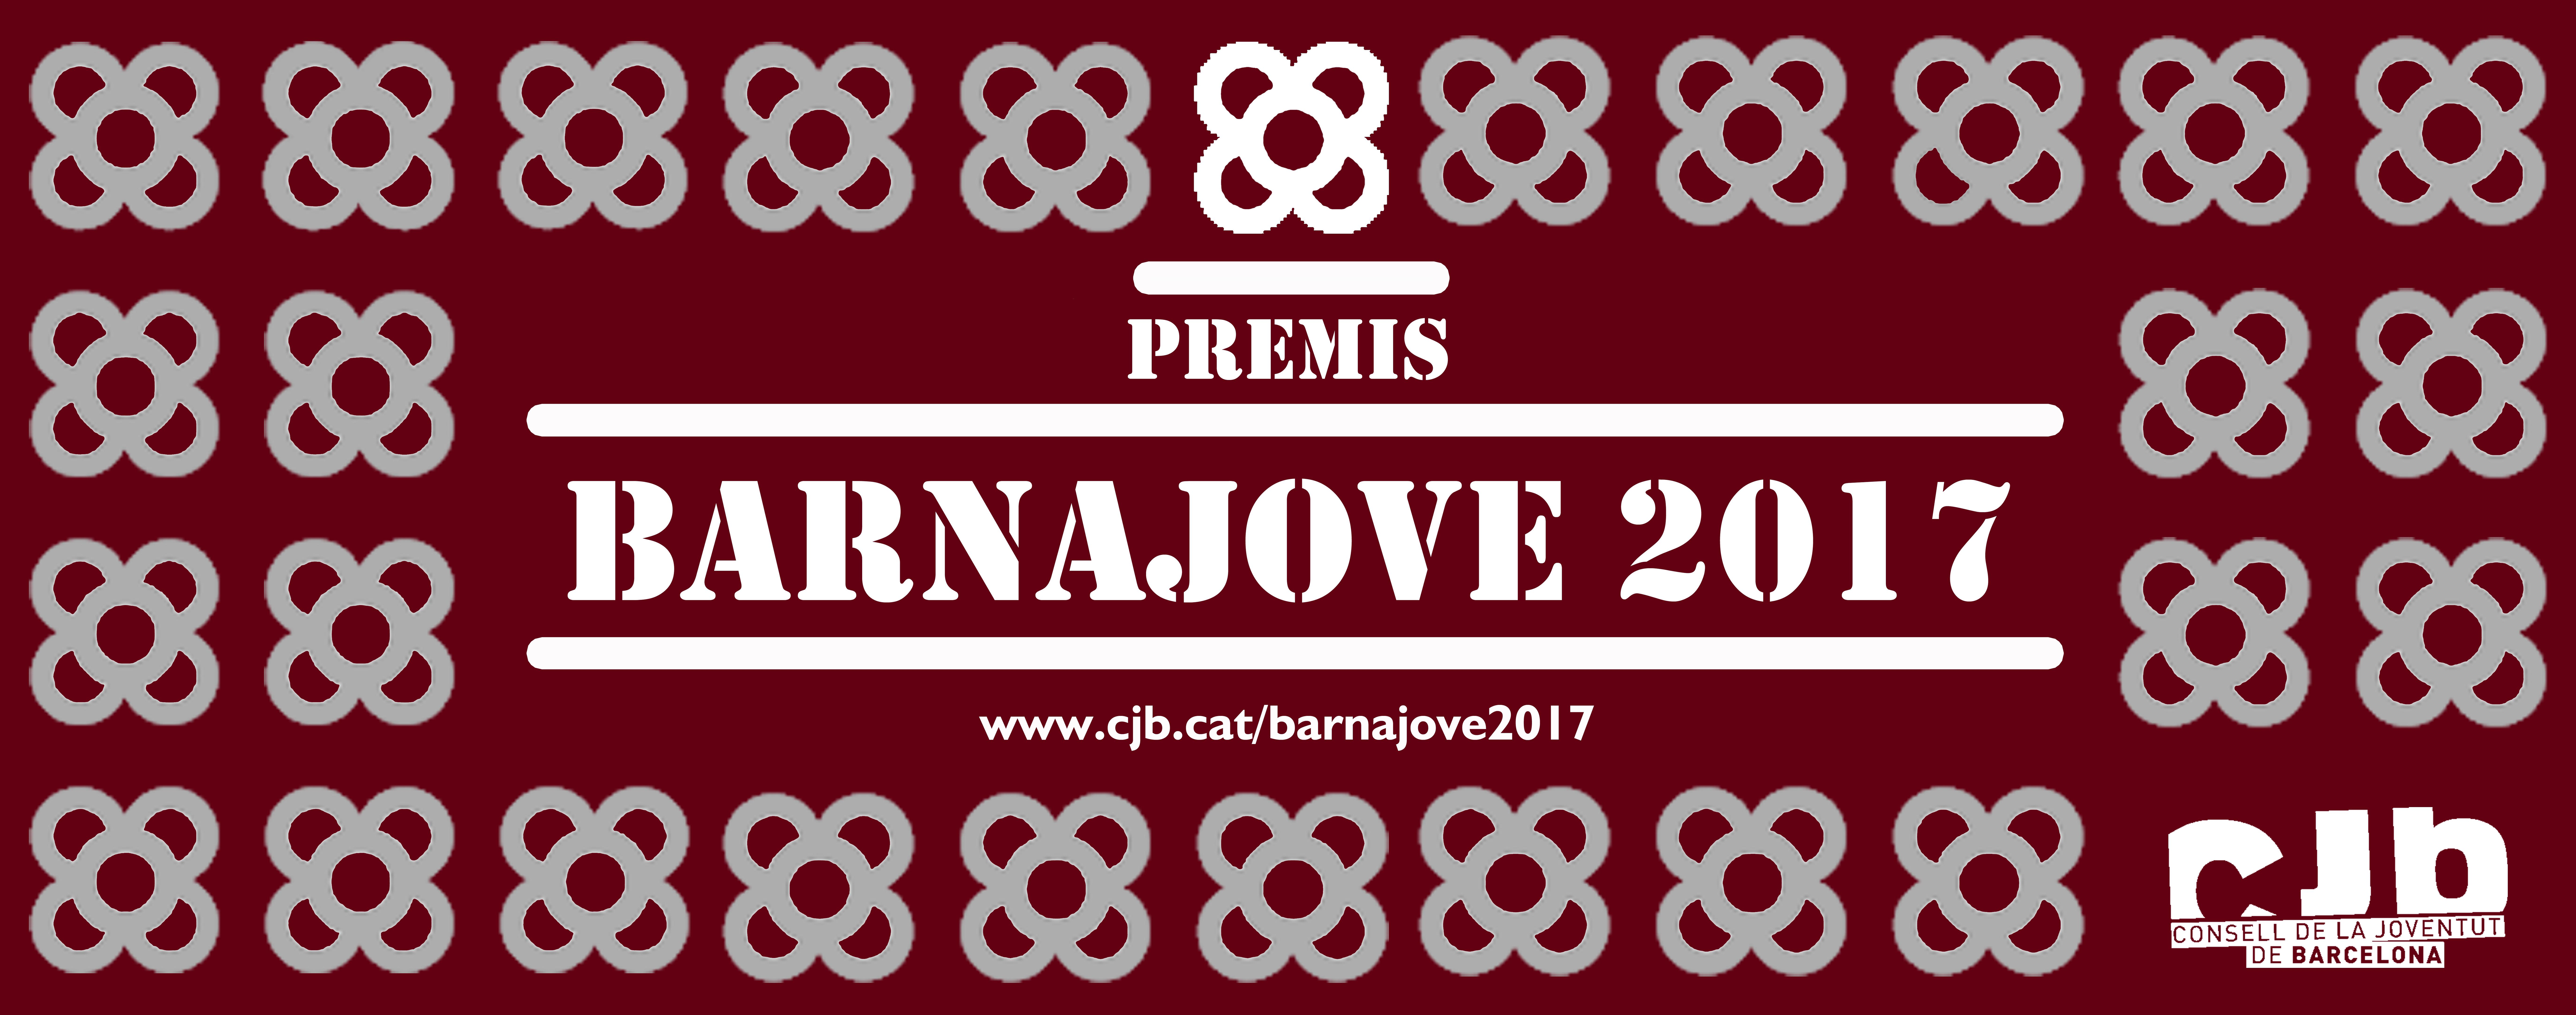 banner-barnajove-2017